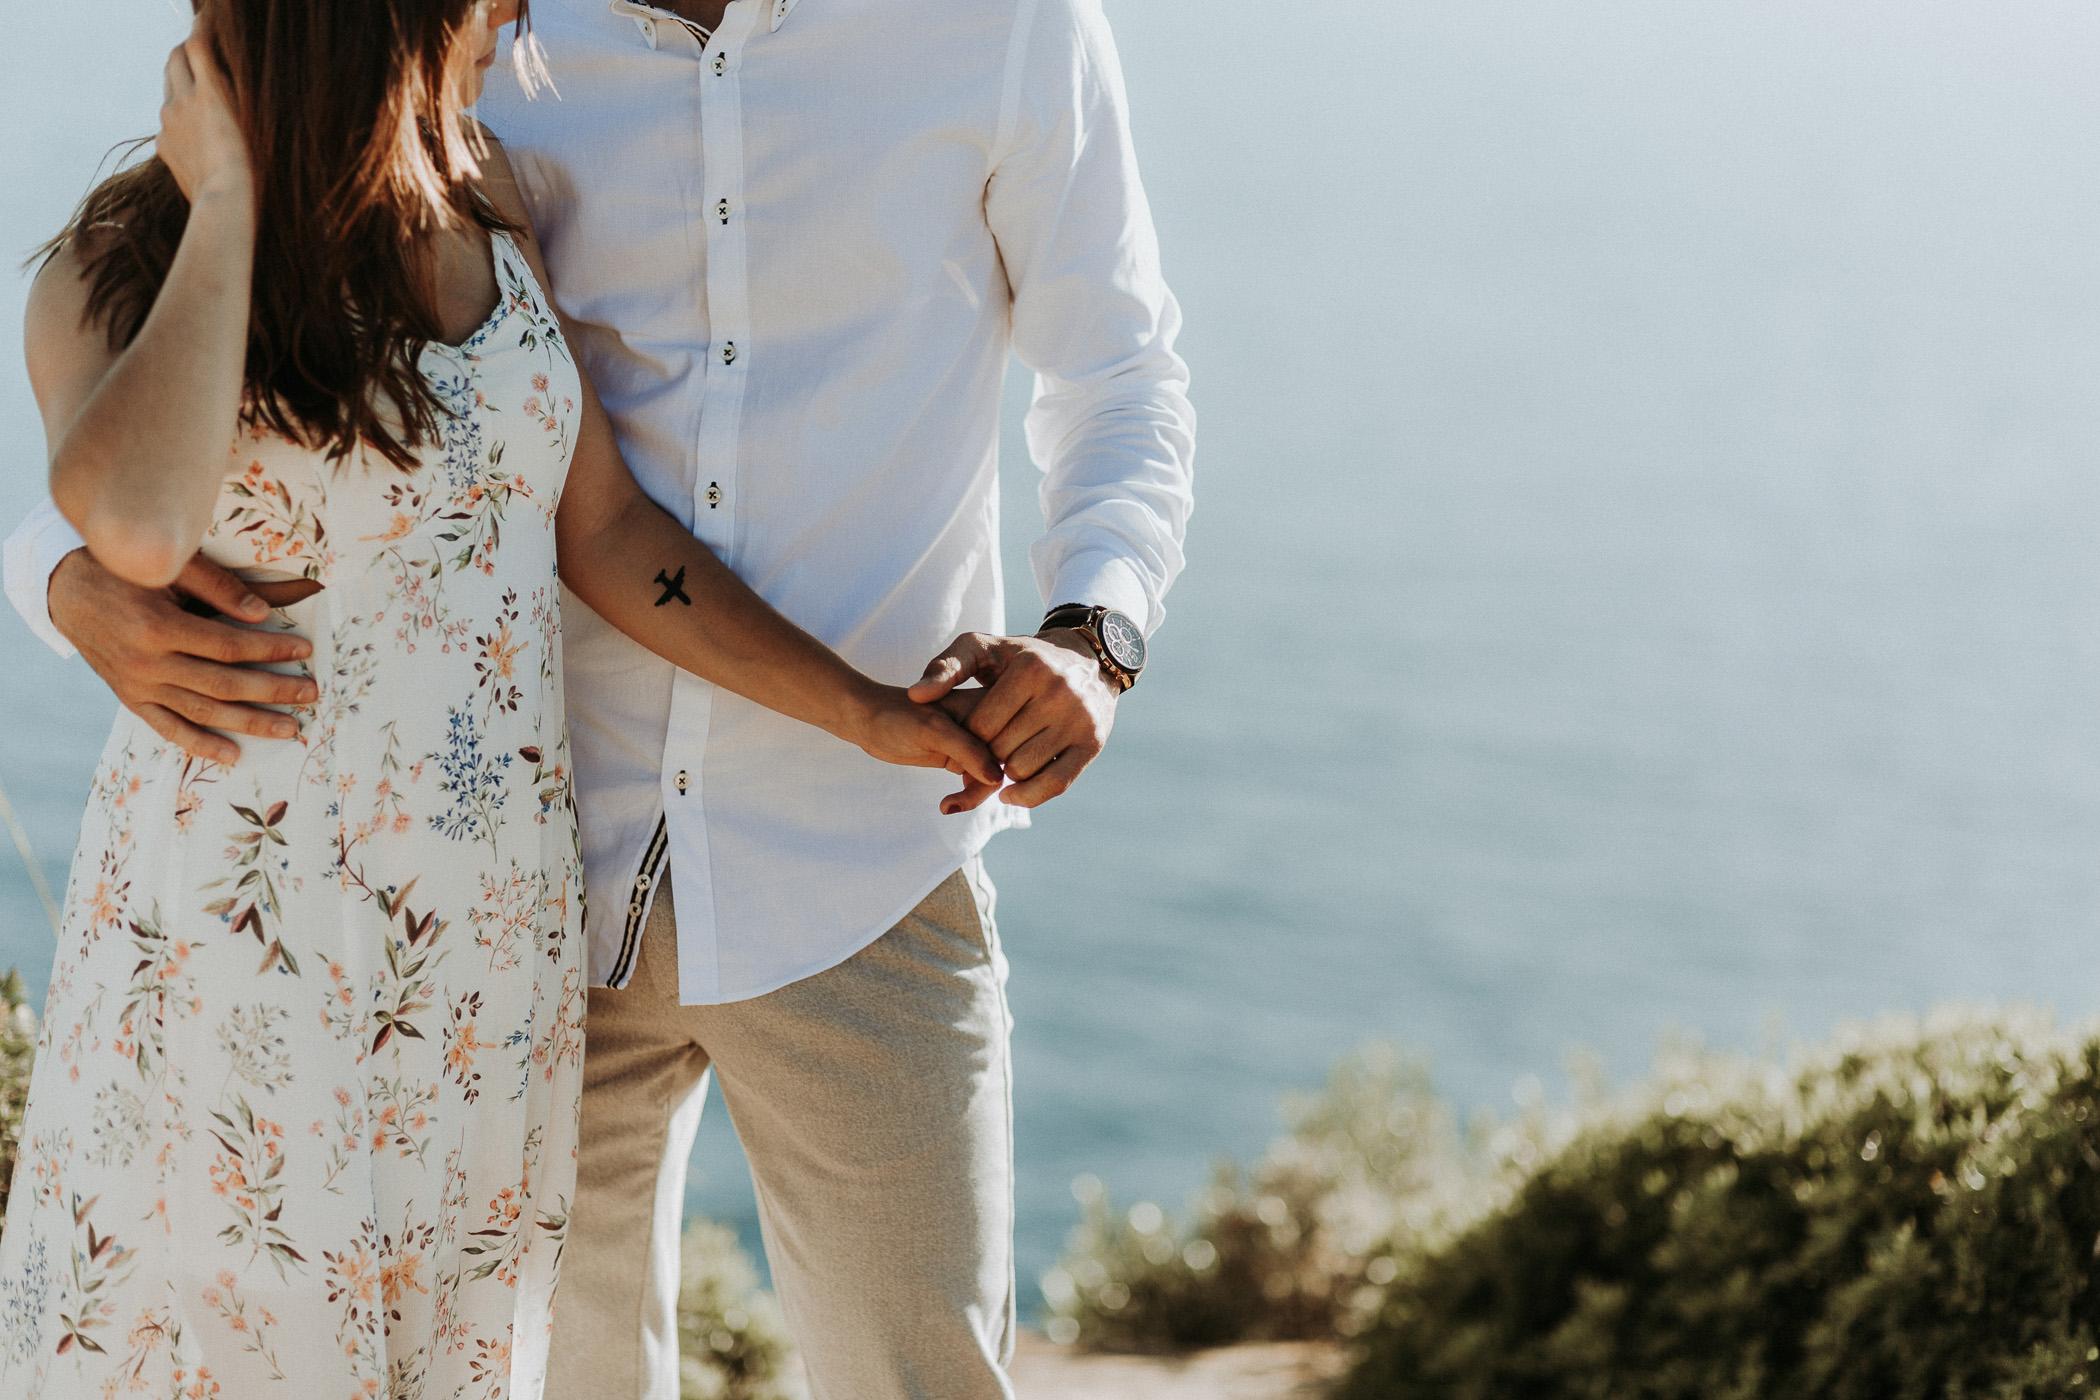 DanielaMarquardtPhotography_wedding_elopement_mallorca_spain_calapi_palma_lauraandtoni_180